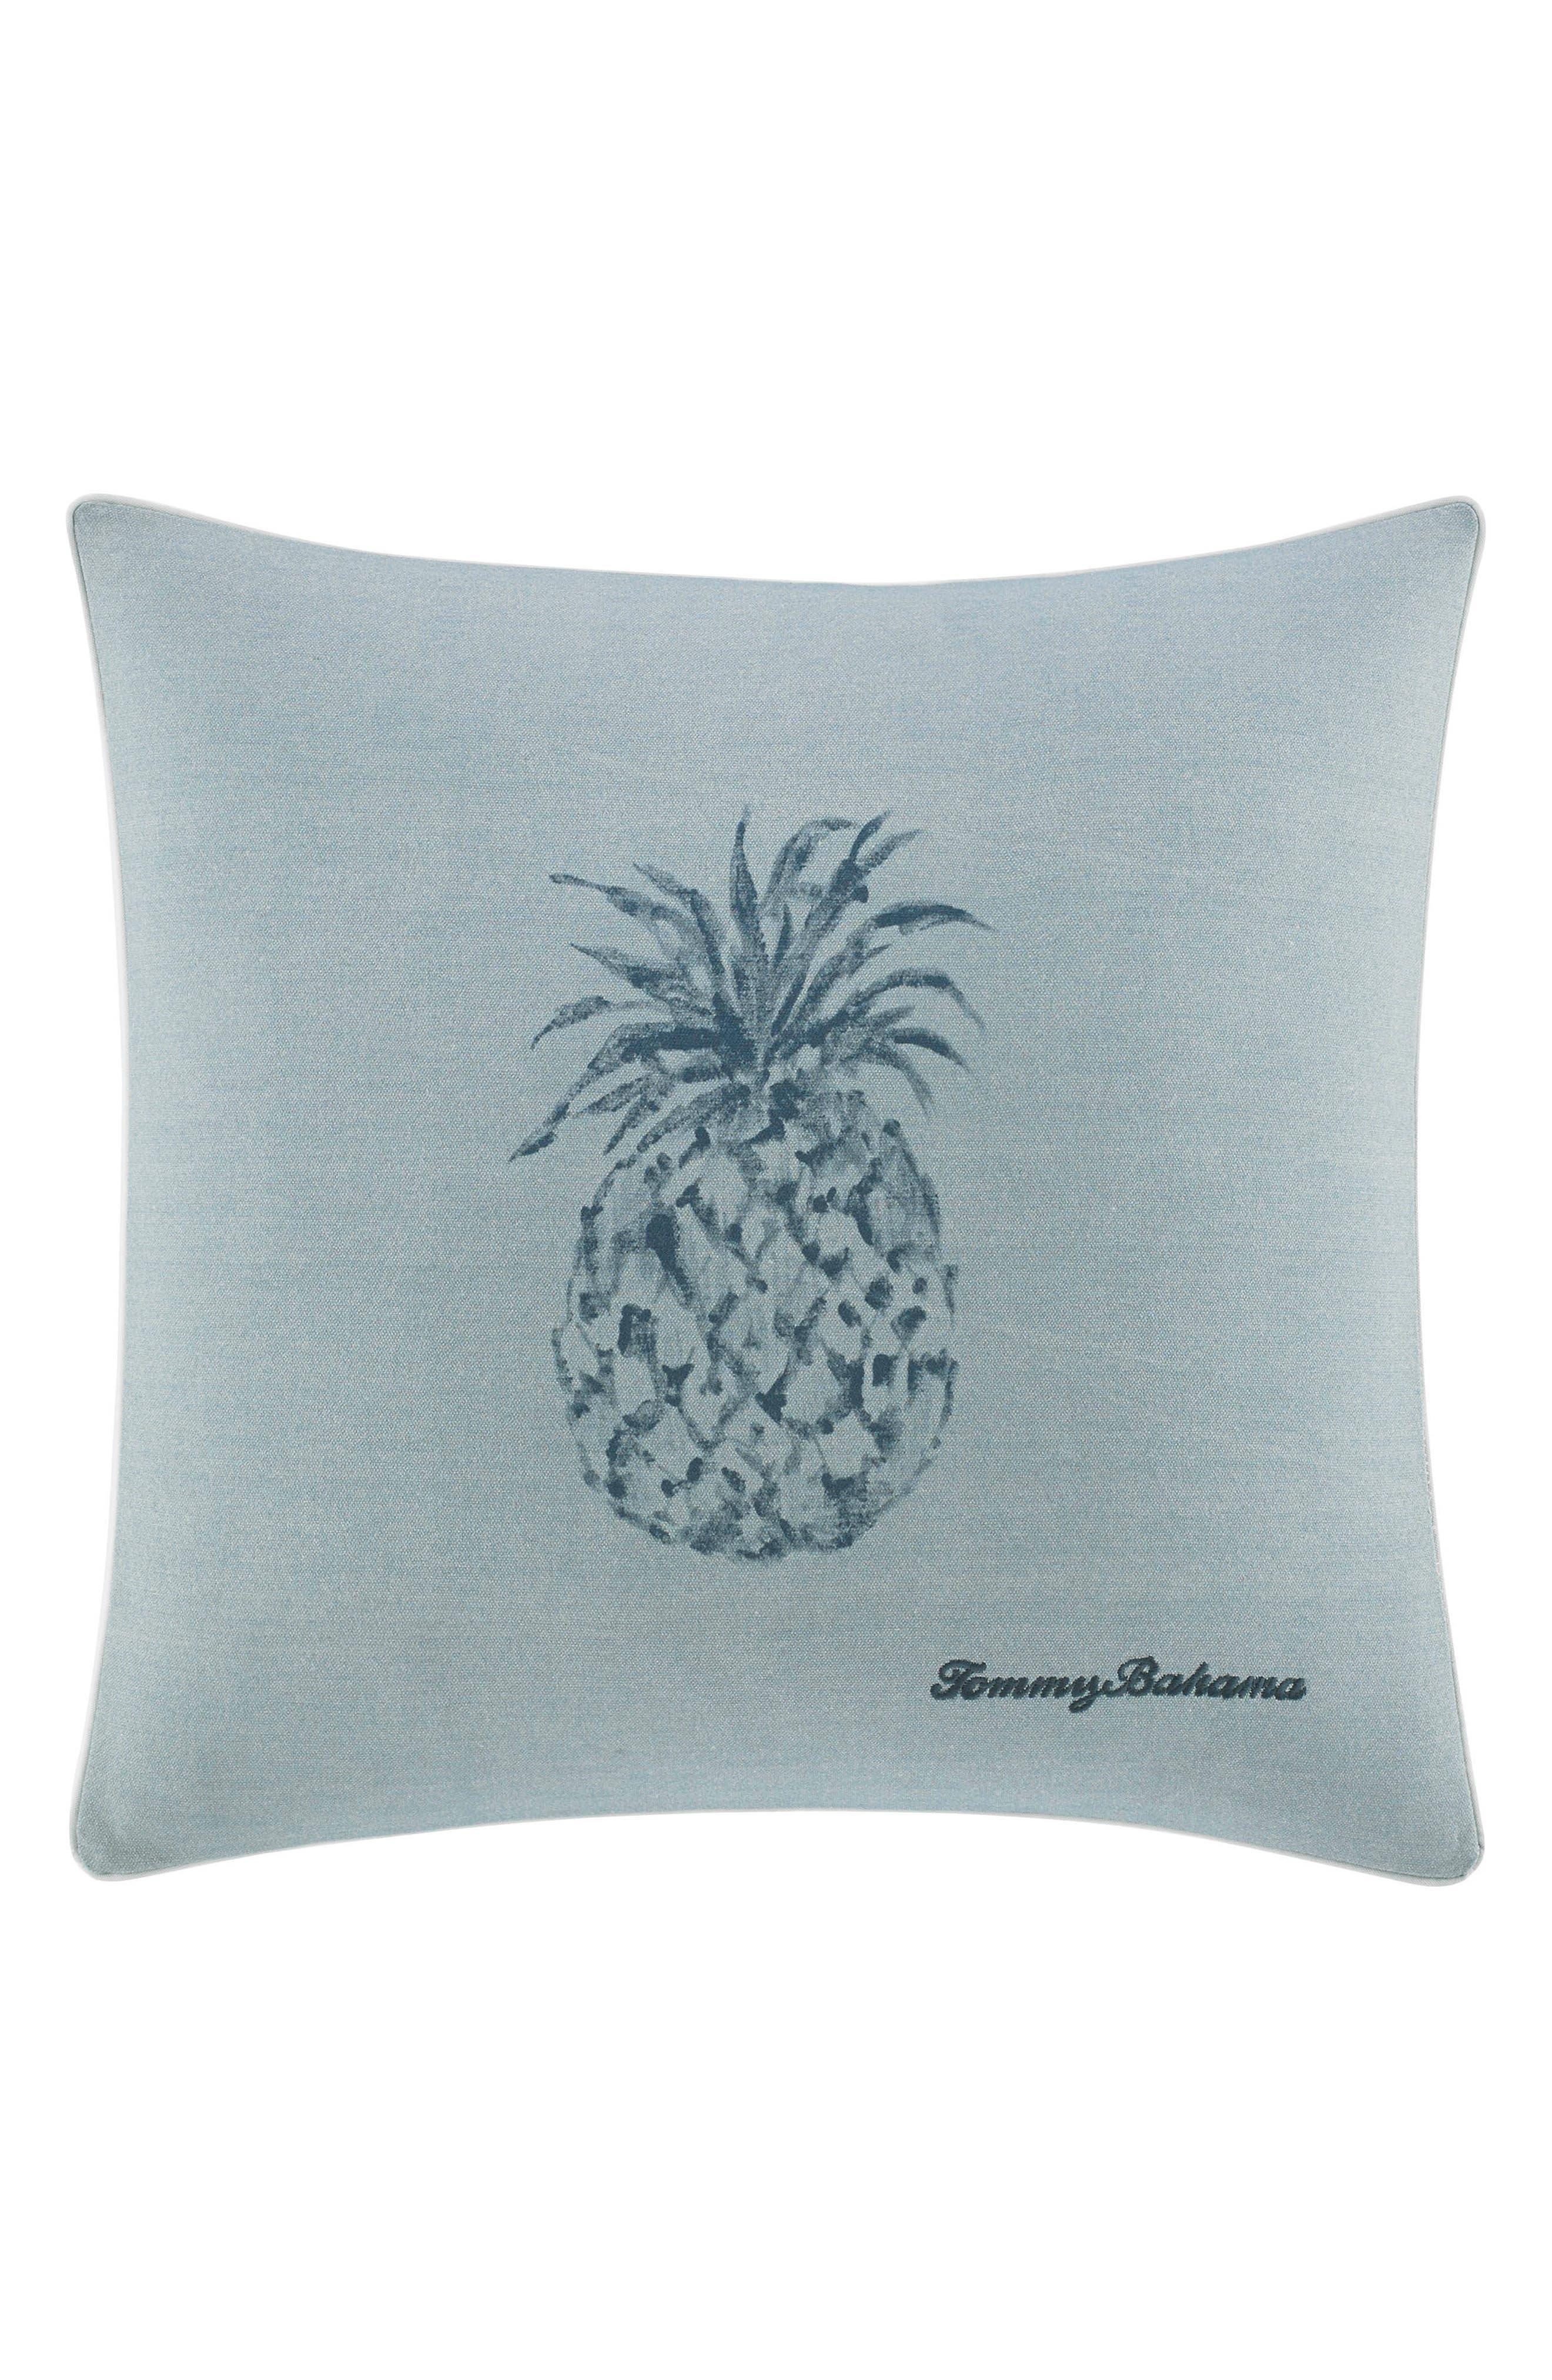 Tommy Bahama Raw Coast Pineapple Pillow